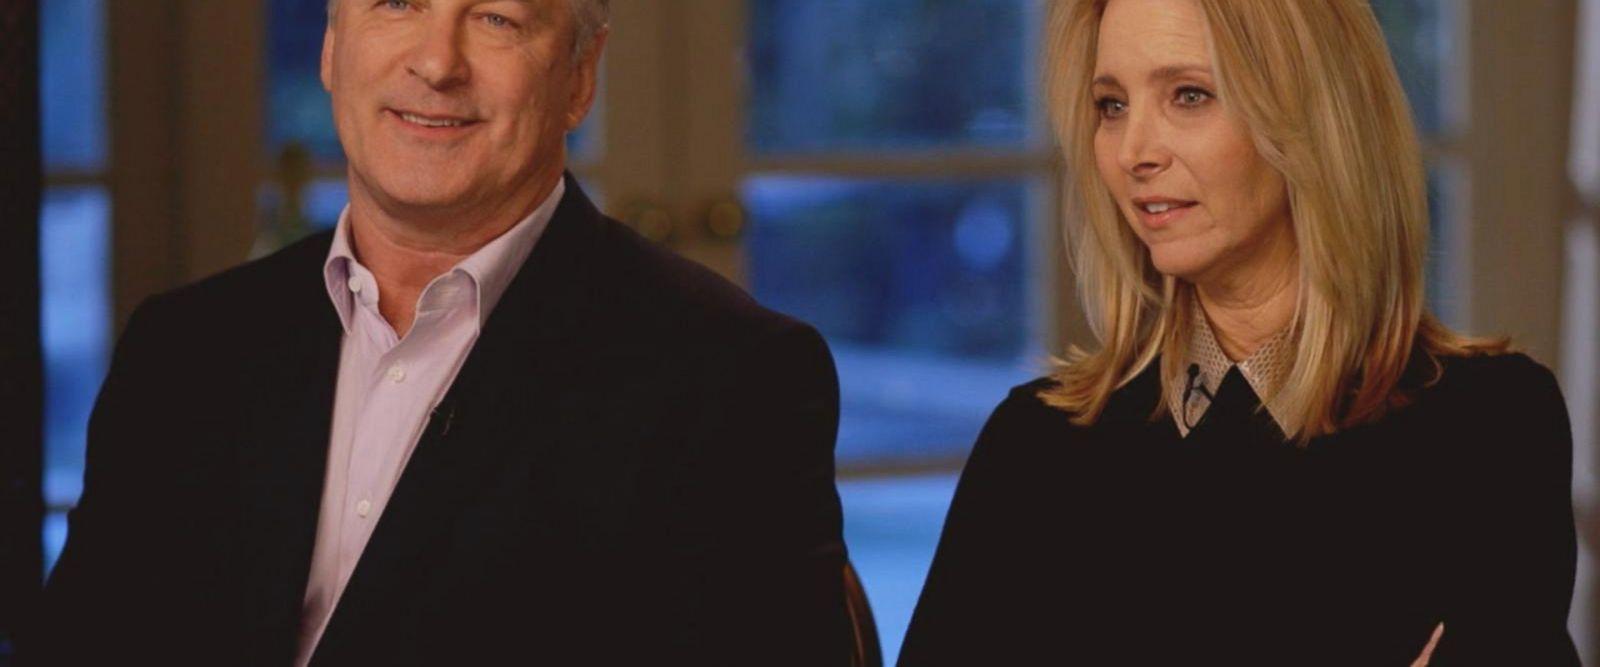 VIDEO: Alec Baldwin and Lisa Kudrow dish on 'Boss Baby'